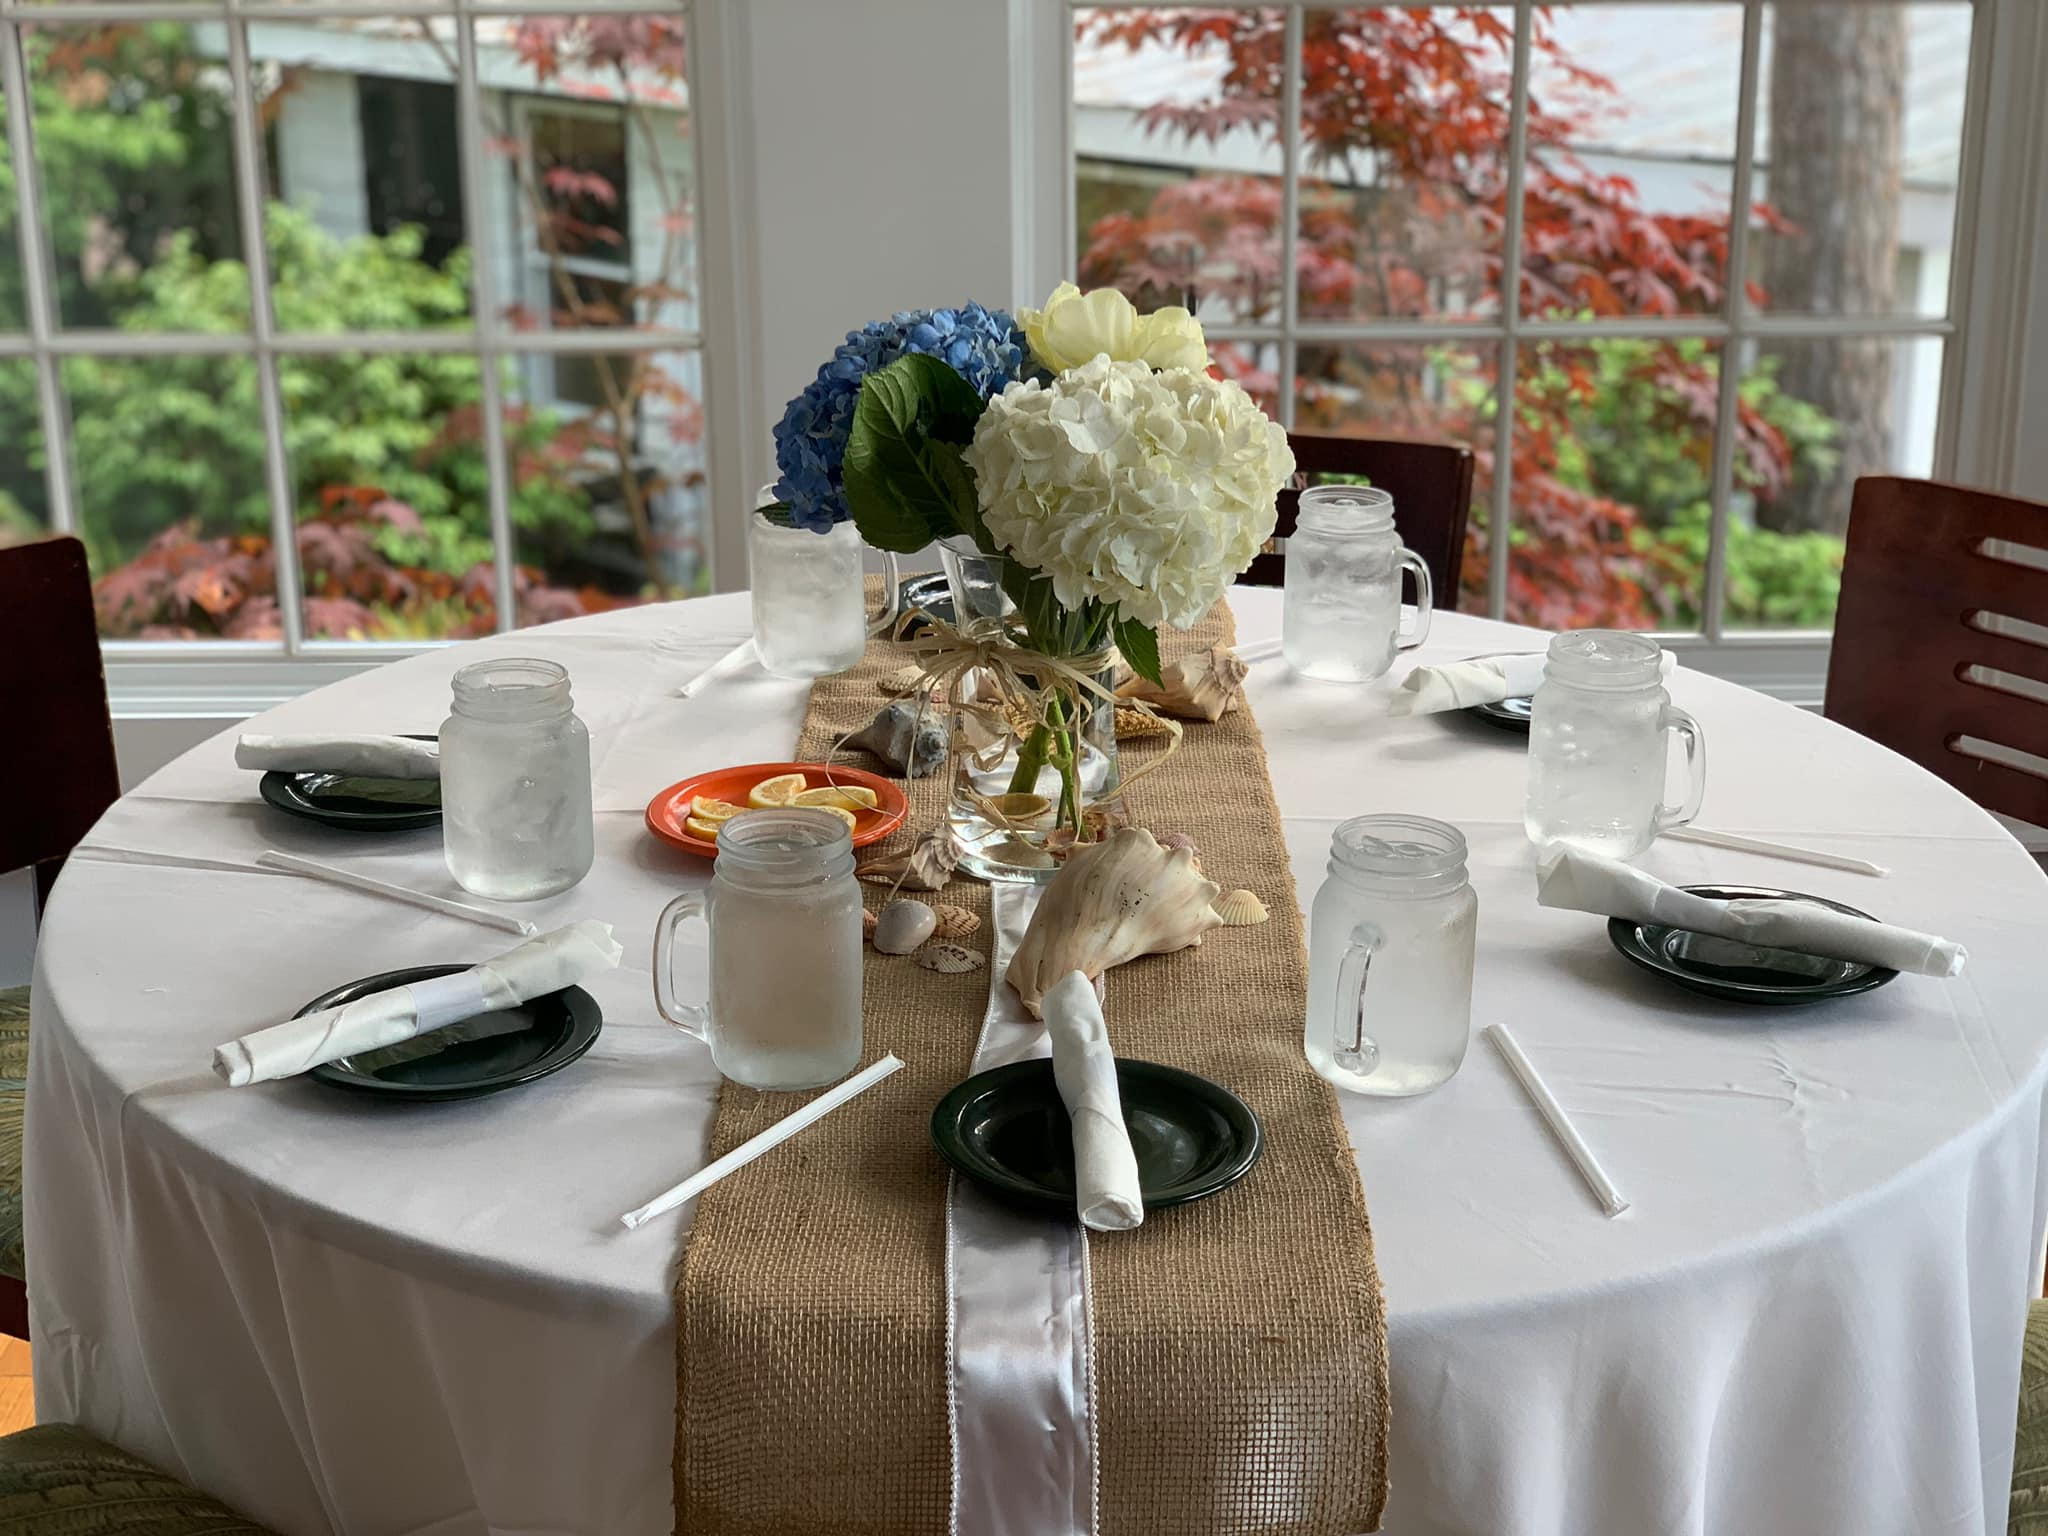 soco table setting.jpg